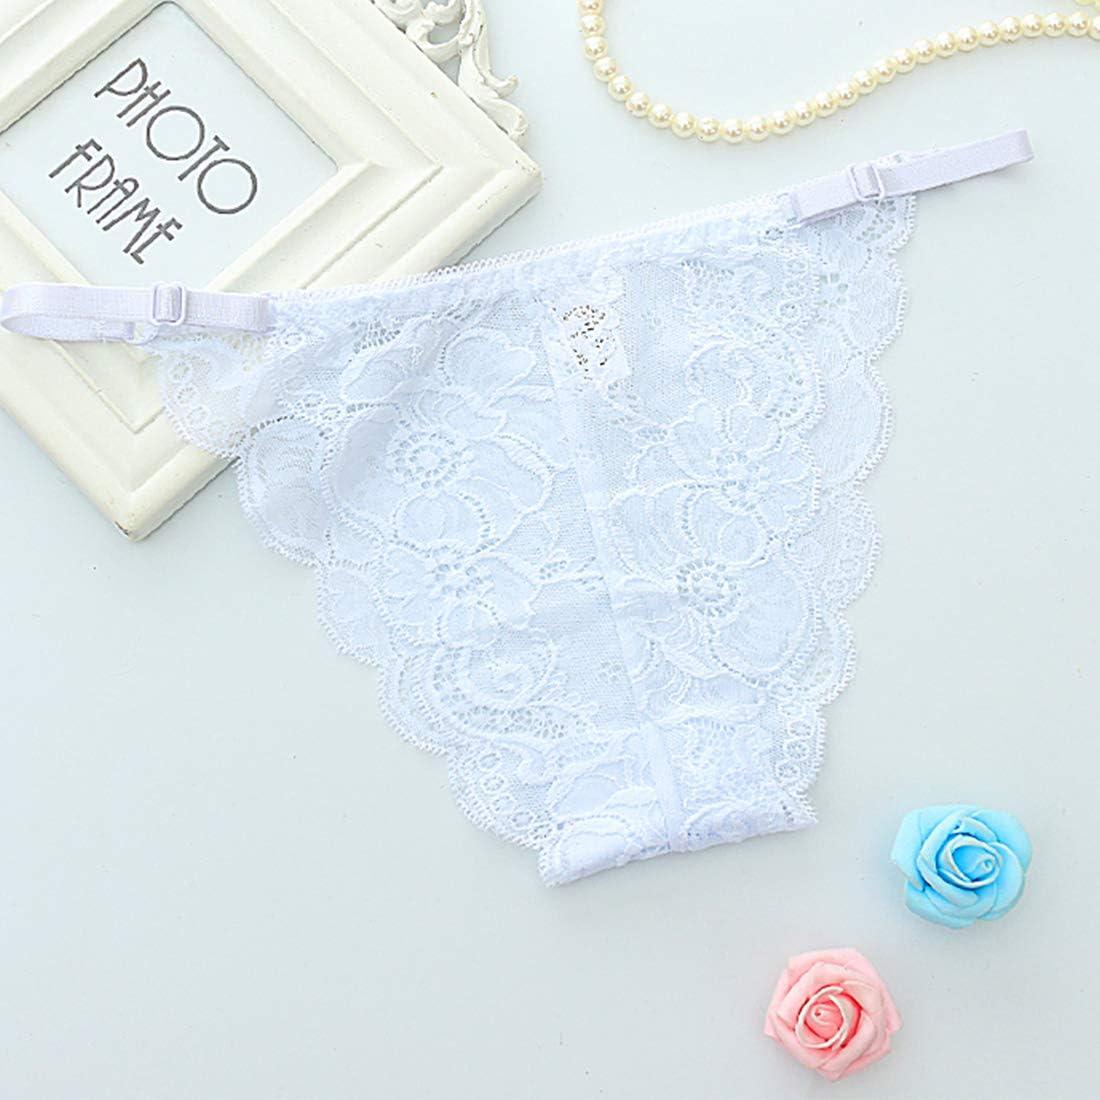 BaiBa Classic Maternity//Maternity//Nursing Bra Without Underwire Cotton Size 80-105 F-J